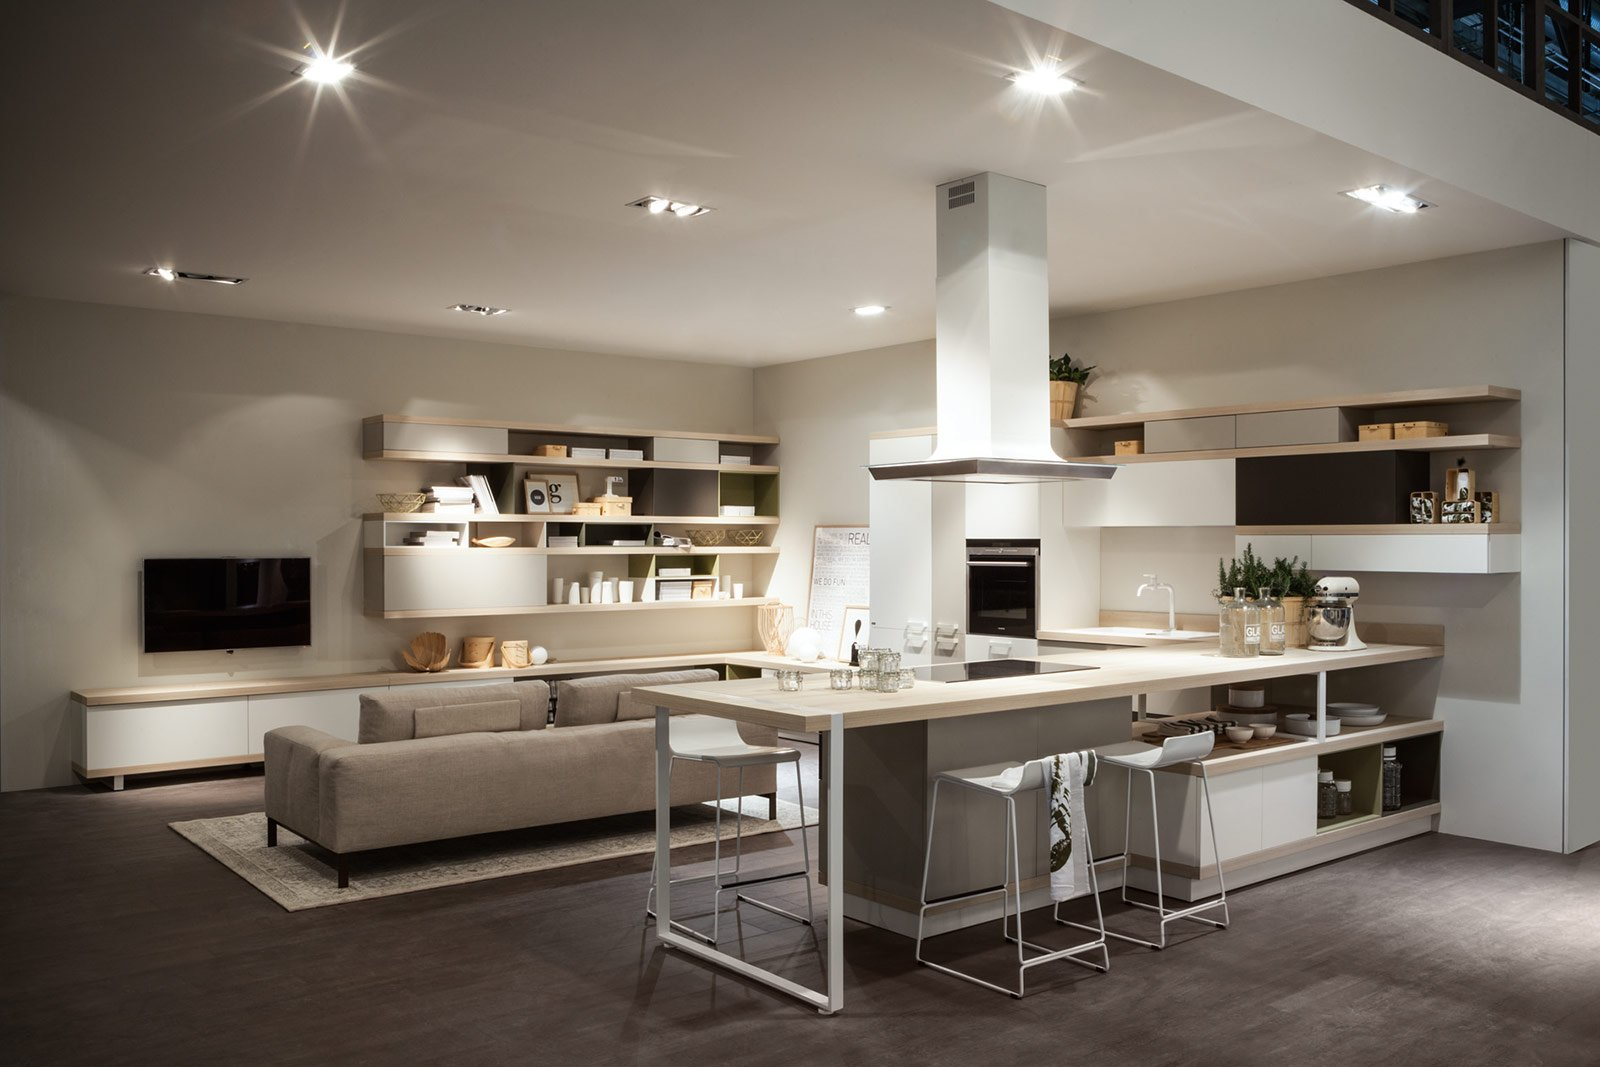 Soggiorno E Cucina - Modelos De Casas - Justrigs.com